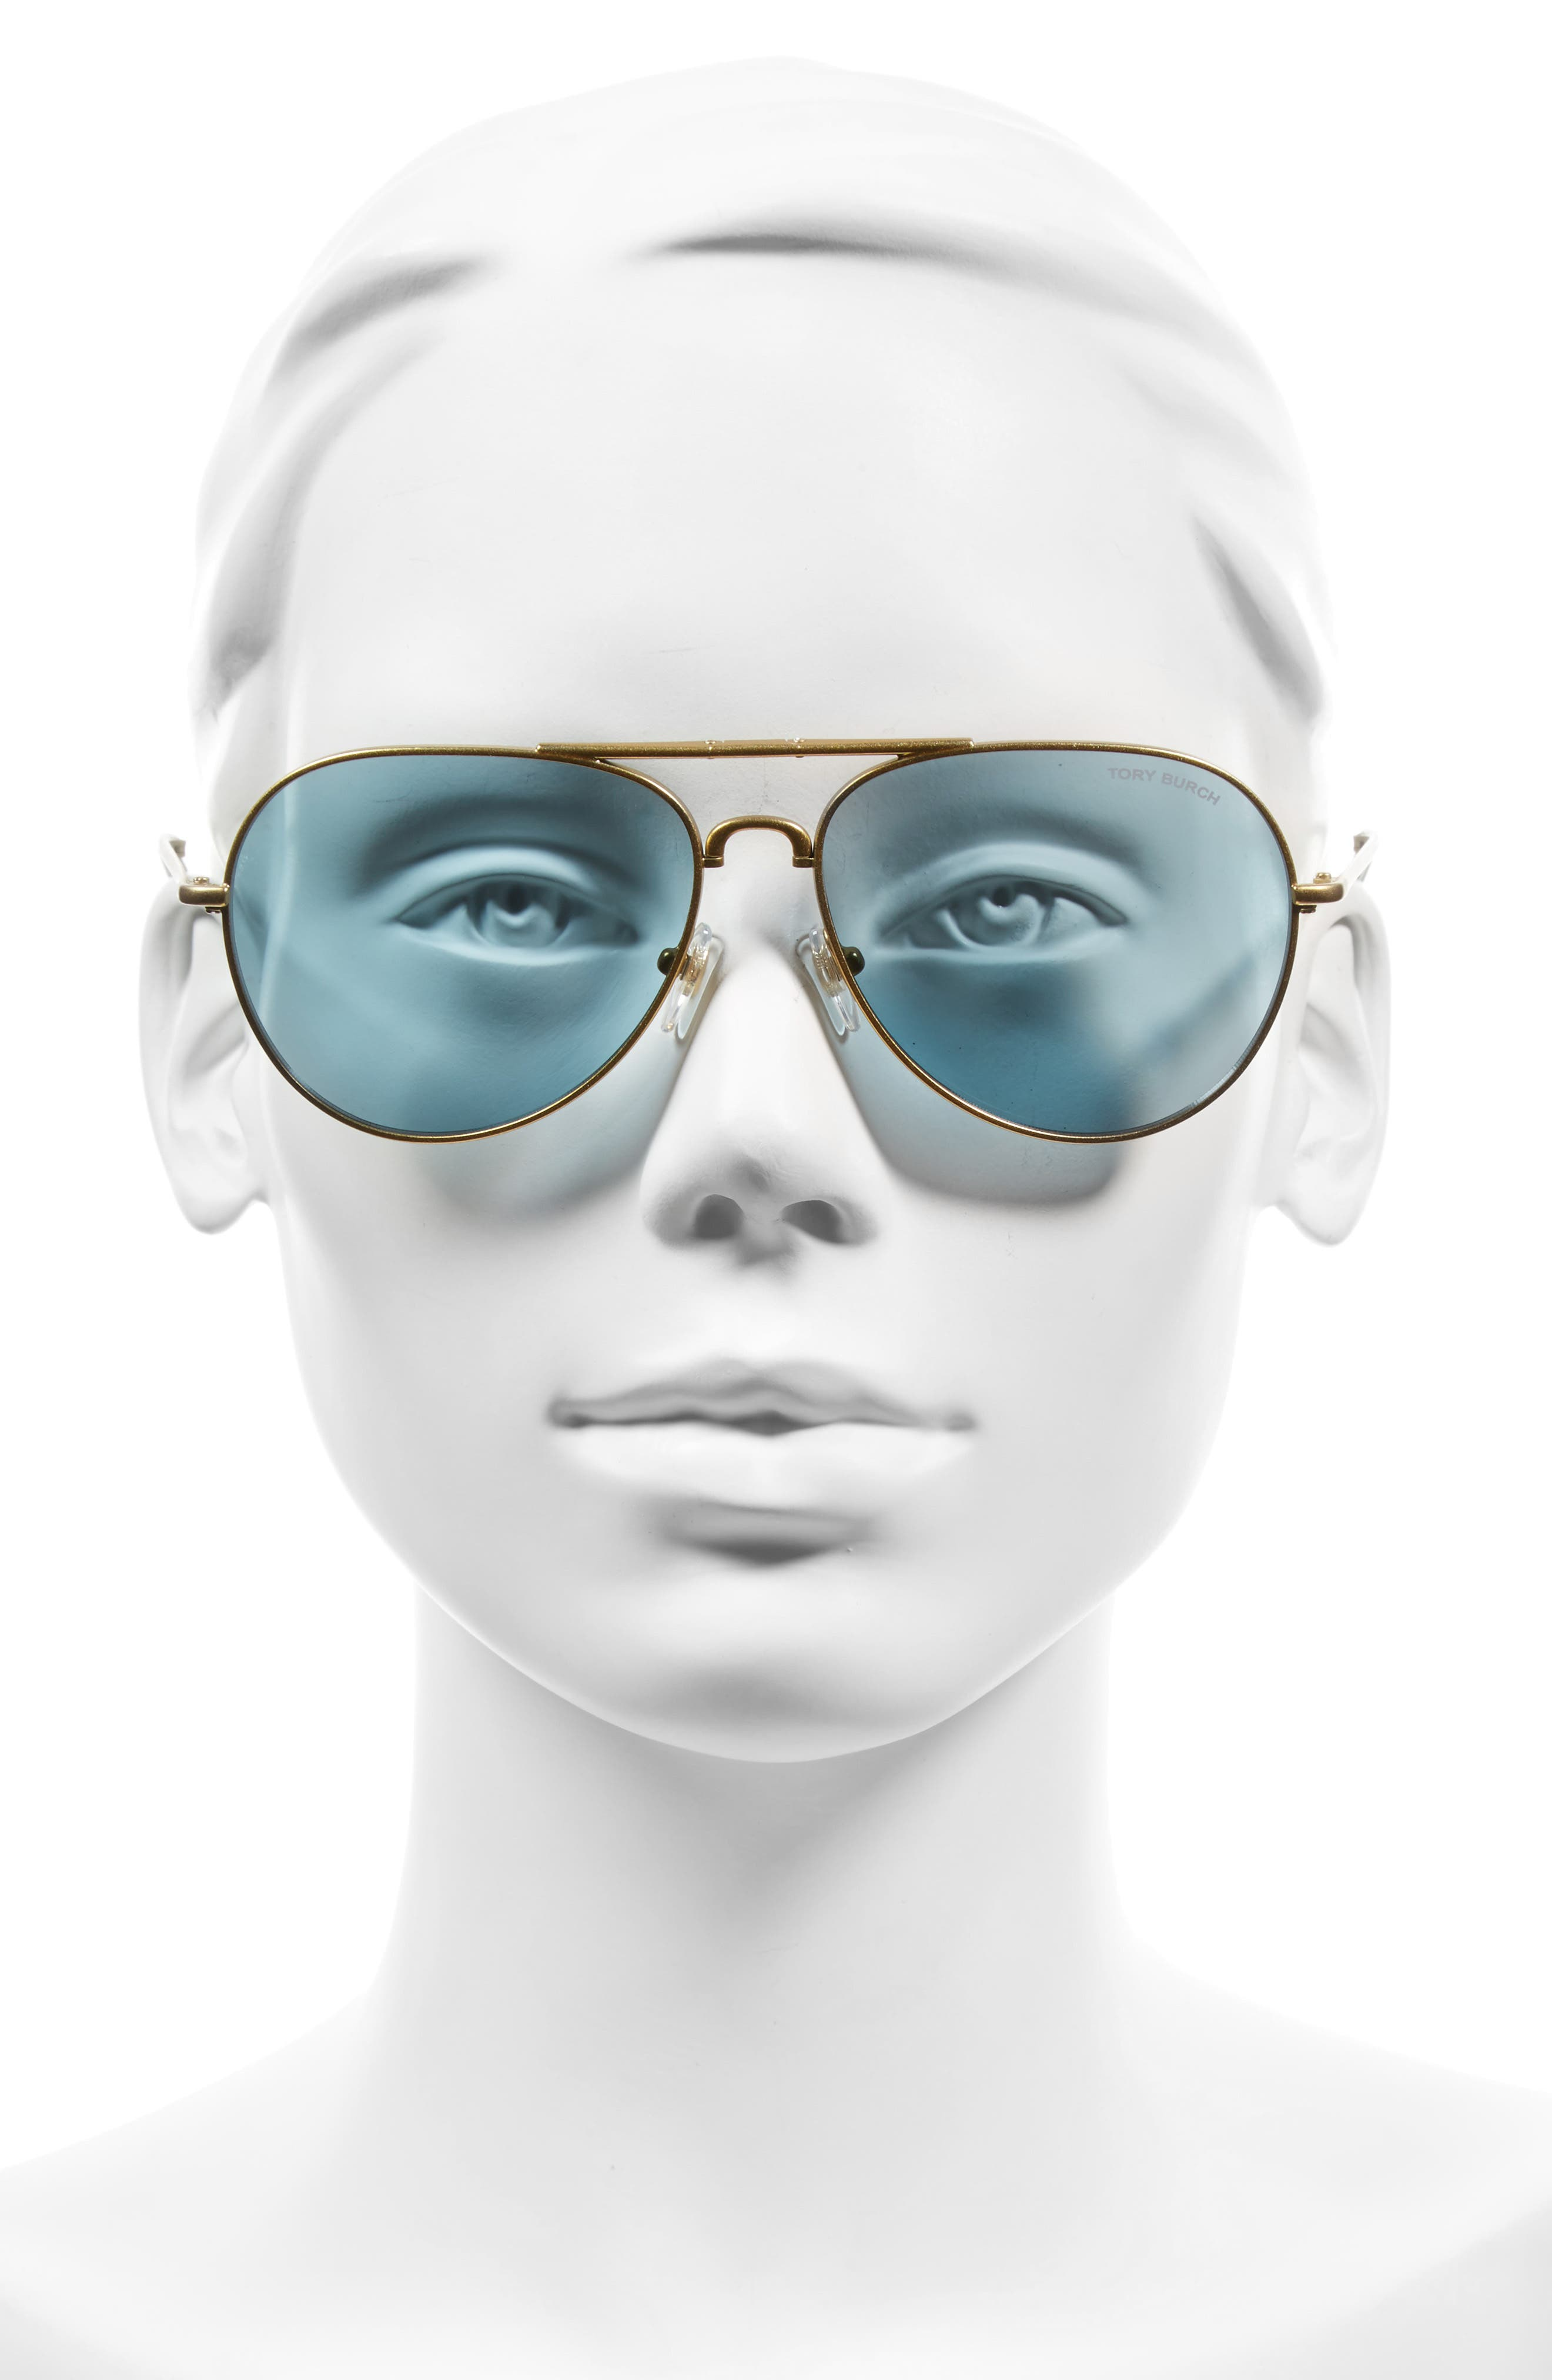 58mm Foldable Aviator Sunglasses,                             Alternate thumbnail 2, color,                             710